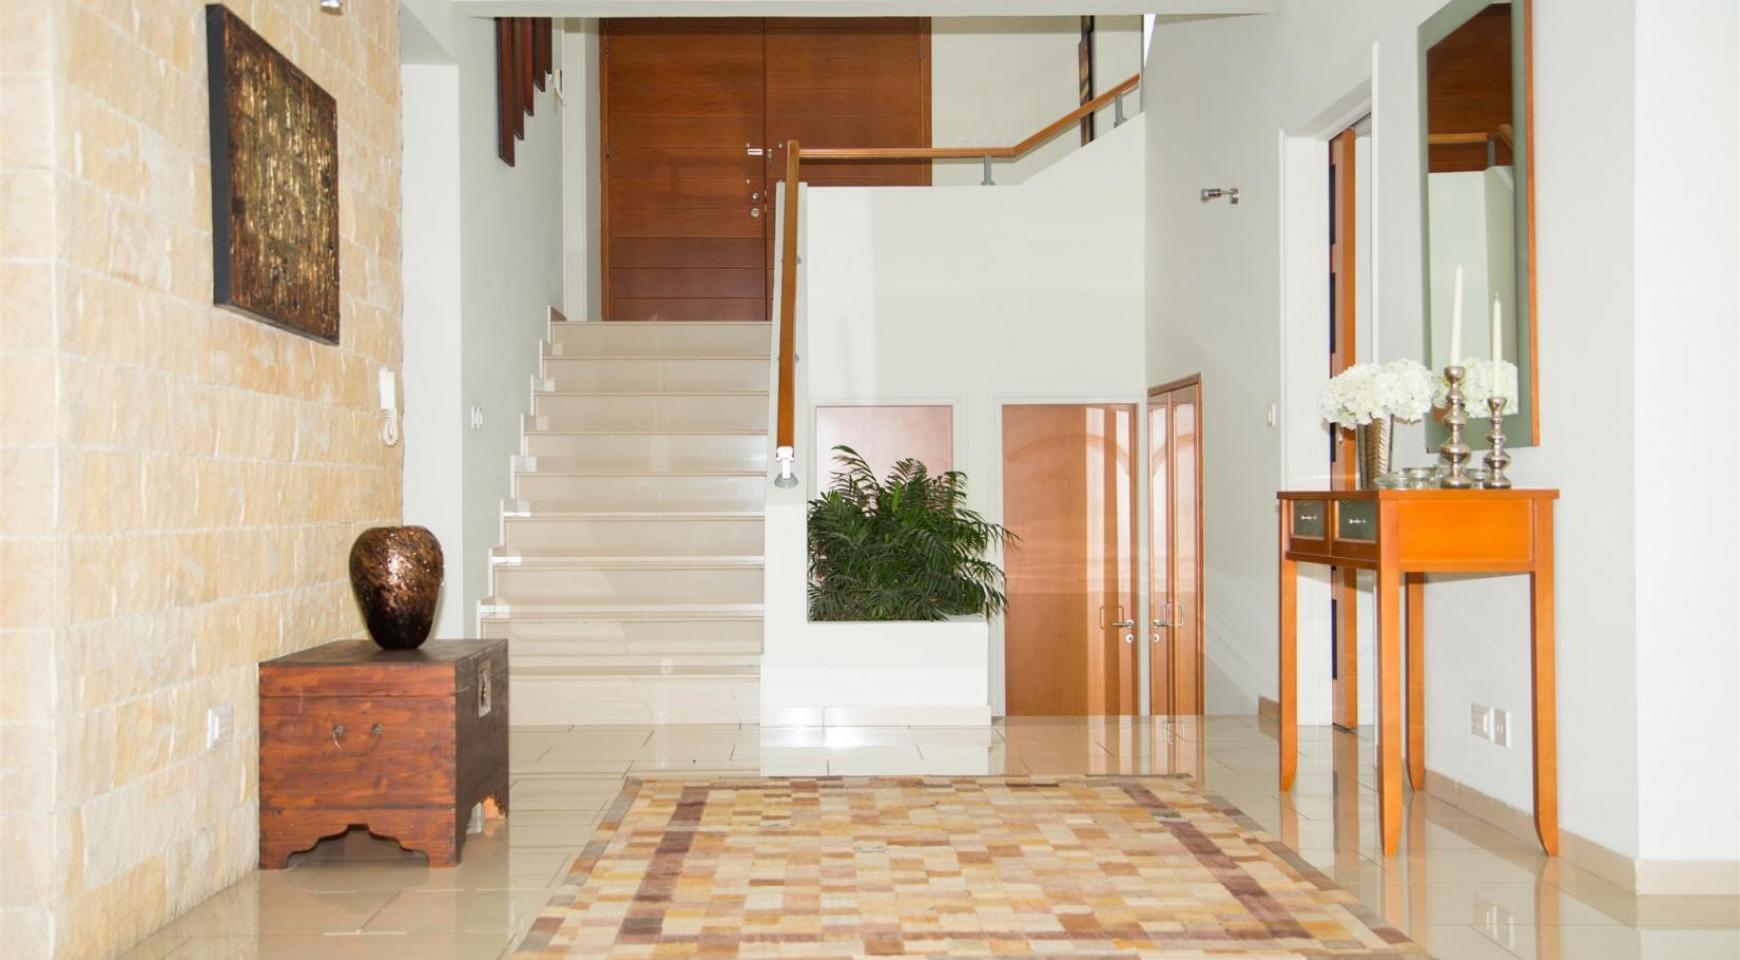 Modern Luxury 4 Bedroom Villa in Sfalagiotisa, Agios Athanasios - 25